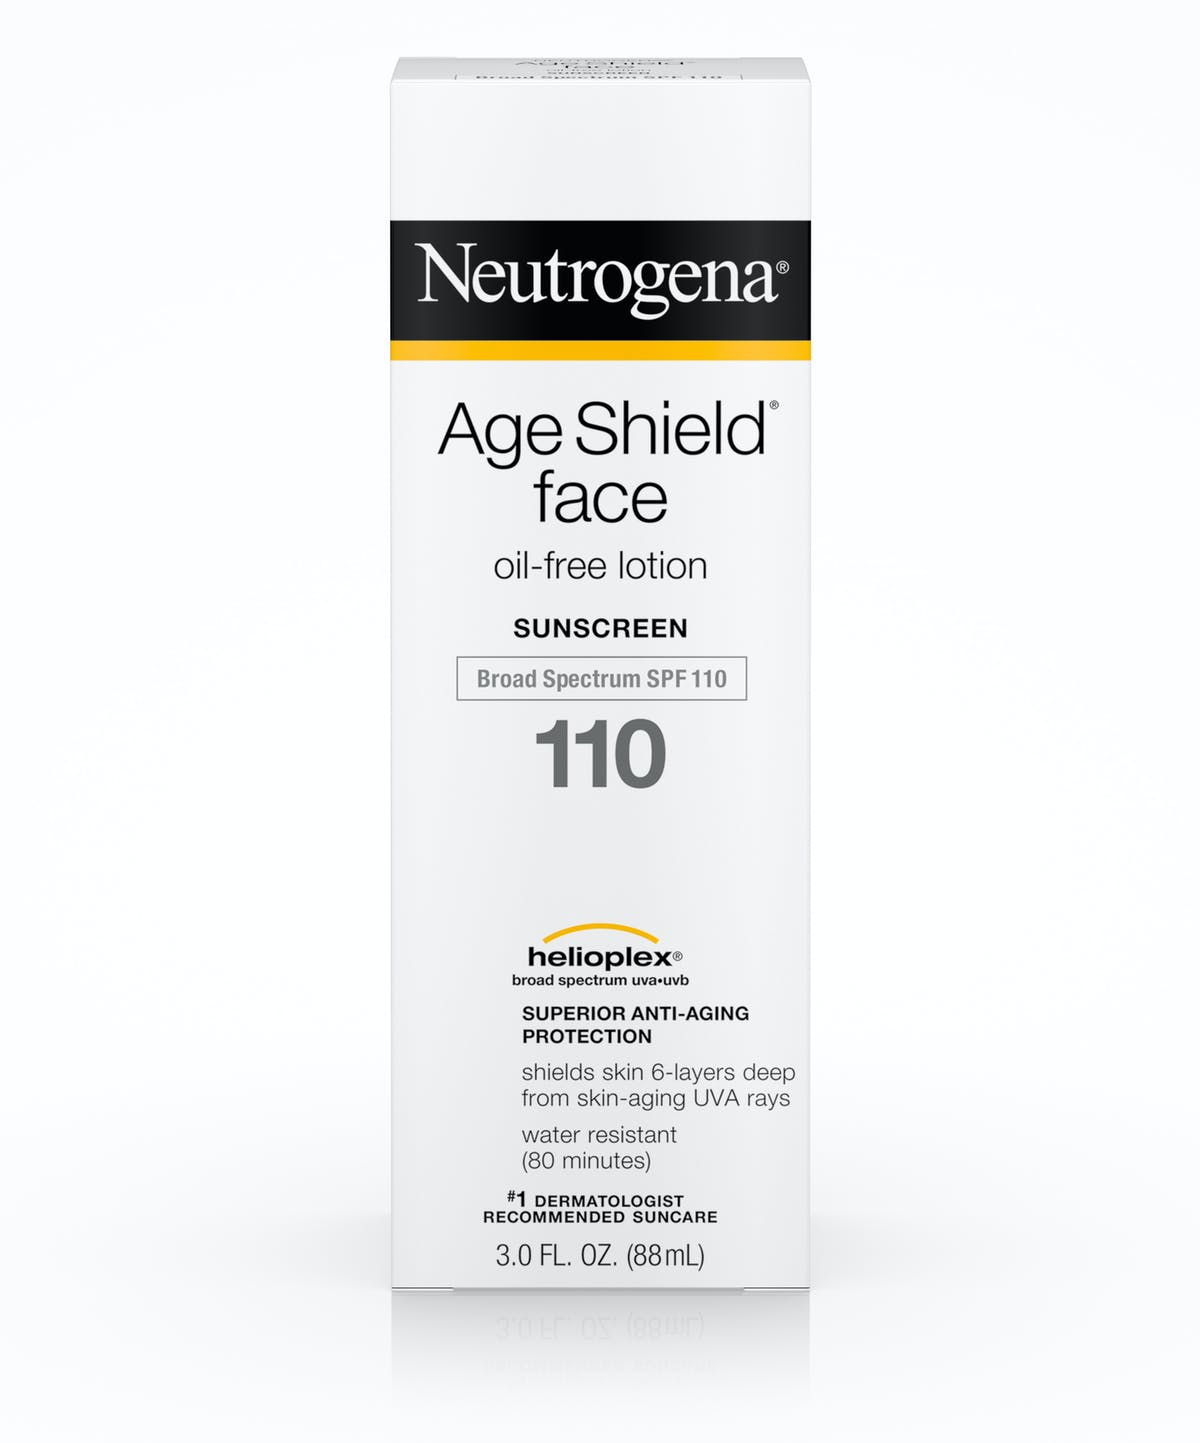 1e9f1a62c ... SPF 110 · Age Shield® Face Oil-Free Lotion Sunscreen Broad Spectrum  ...